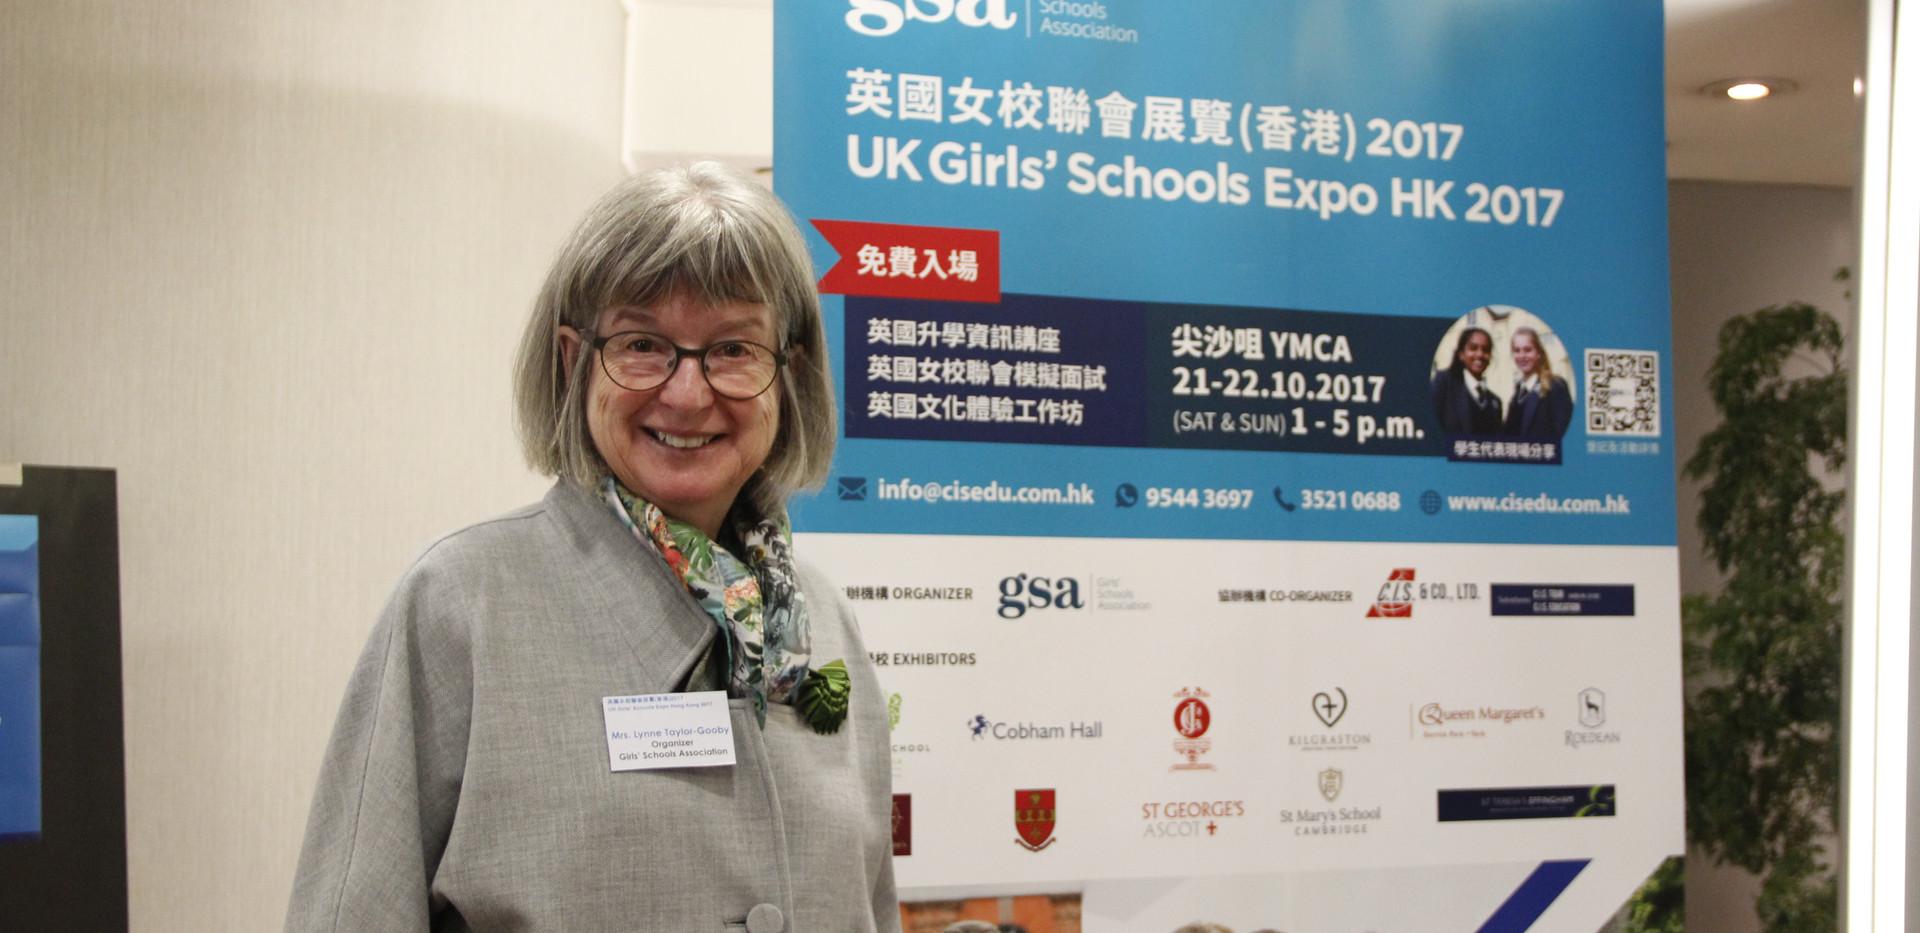 CIS Education - GSA - Lynne Taylor Gooby